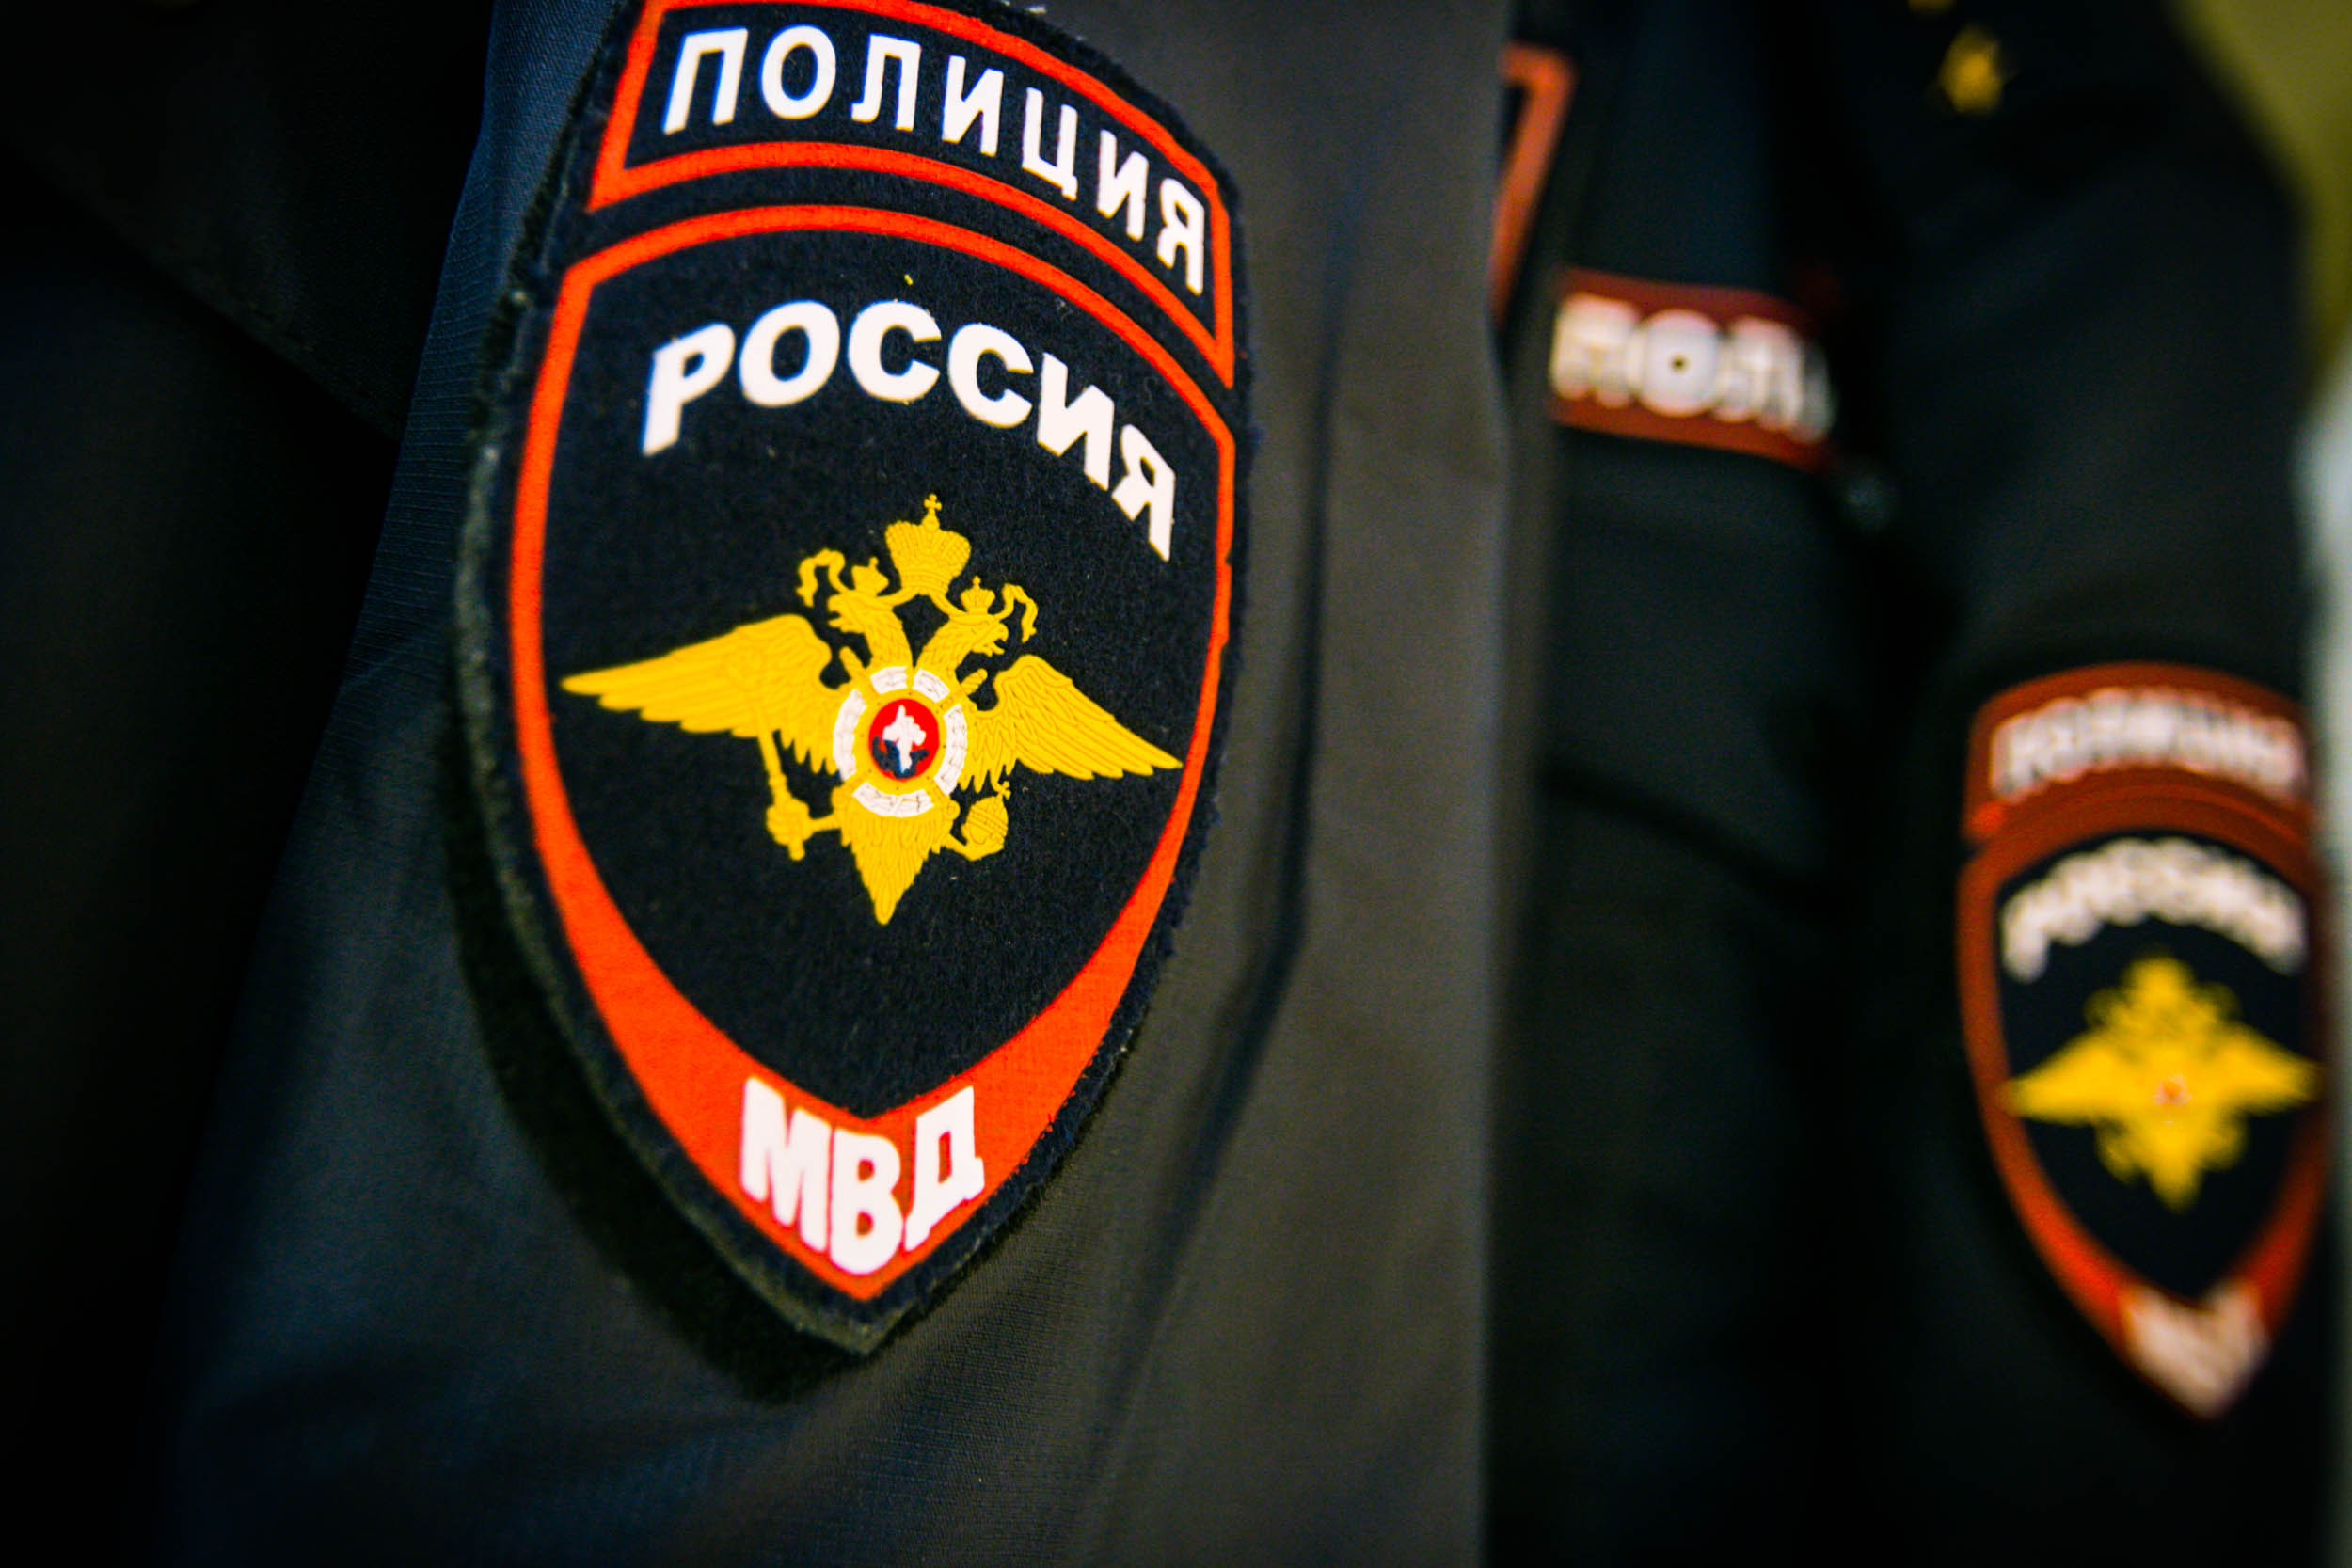 ВПятигорске нетрезвый мужчина подорвал гранату усебя дома